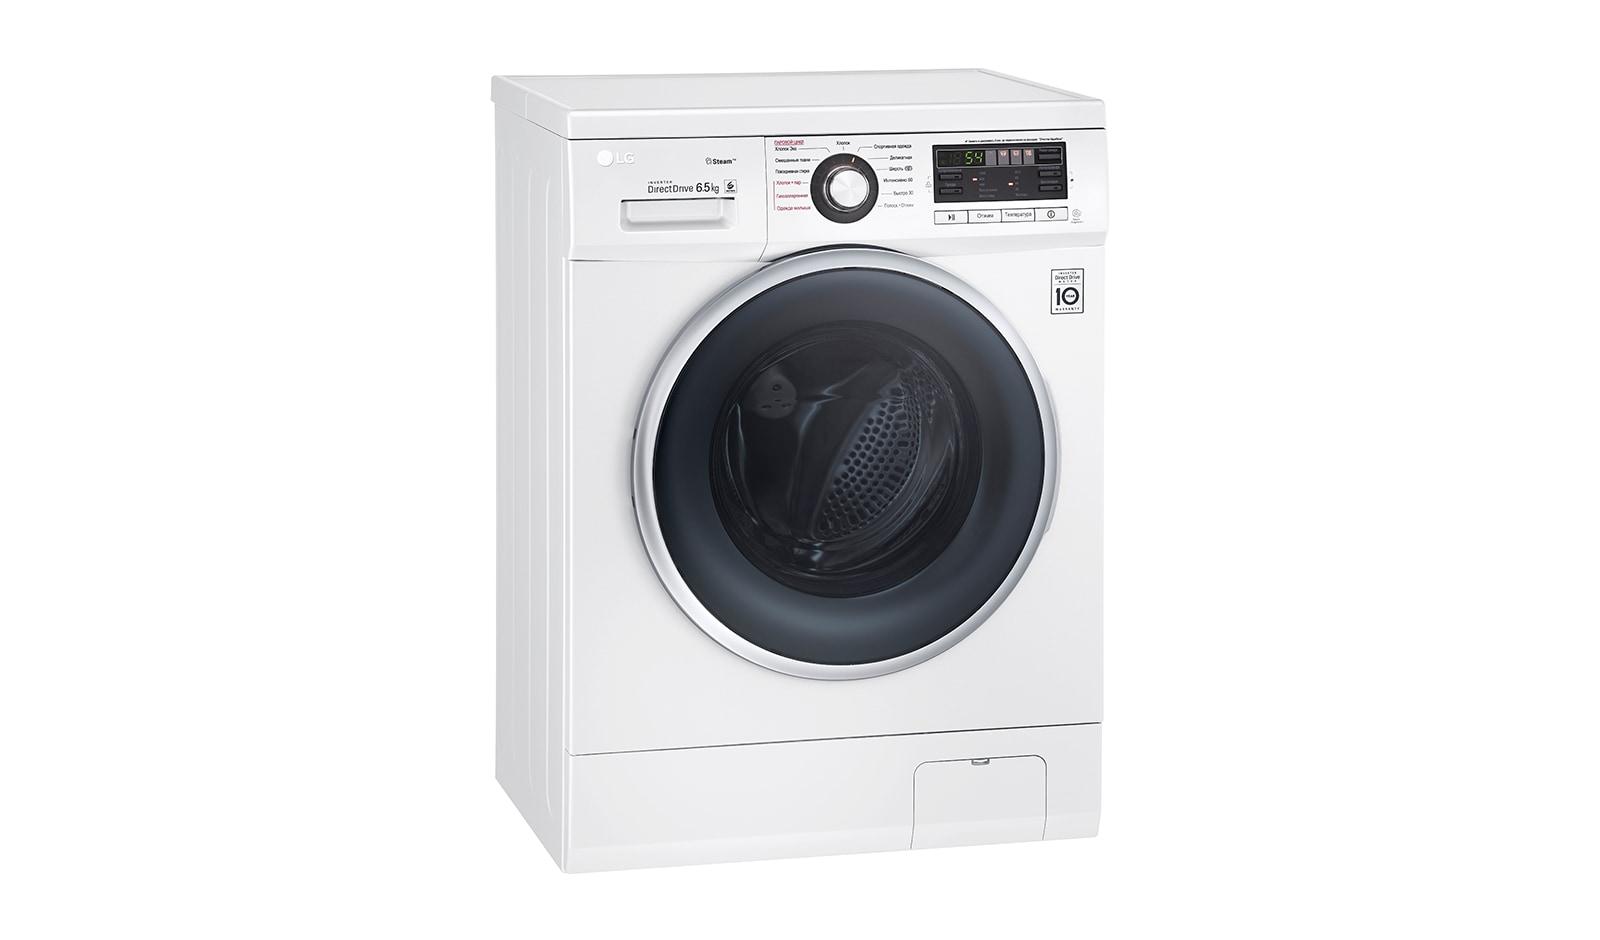 инструкция стиральная машина Lg F1296wds - фото 7